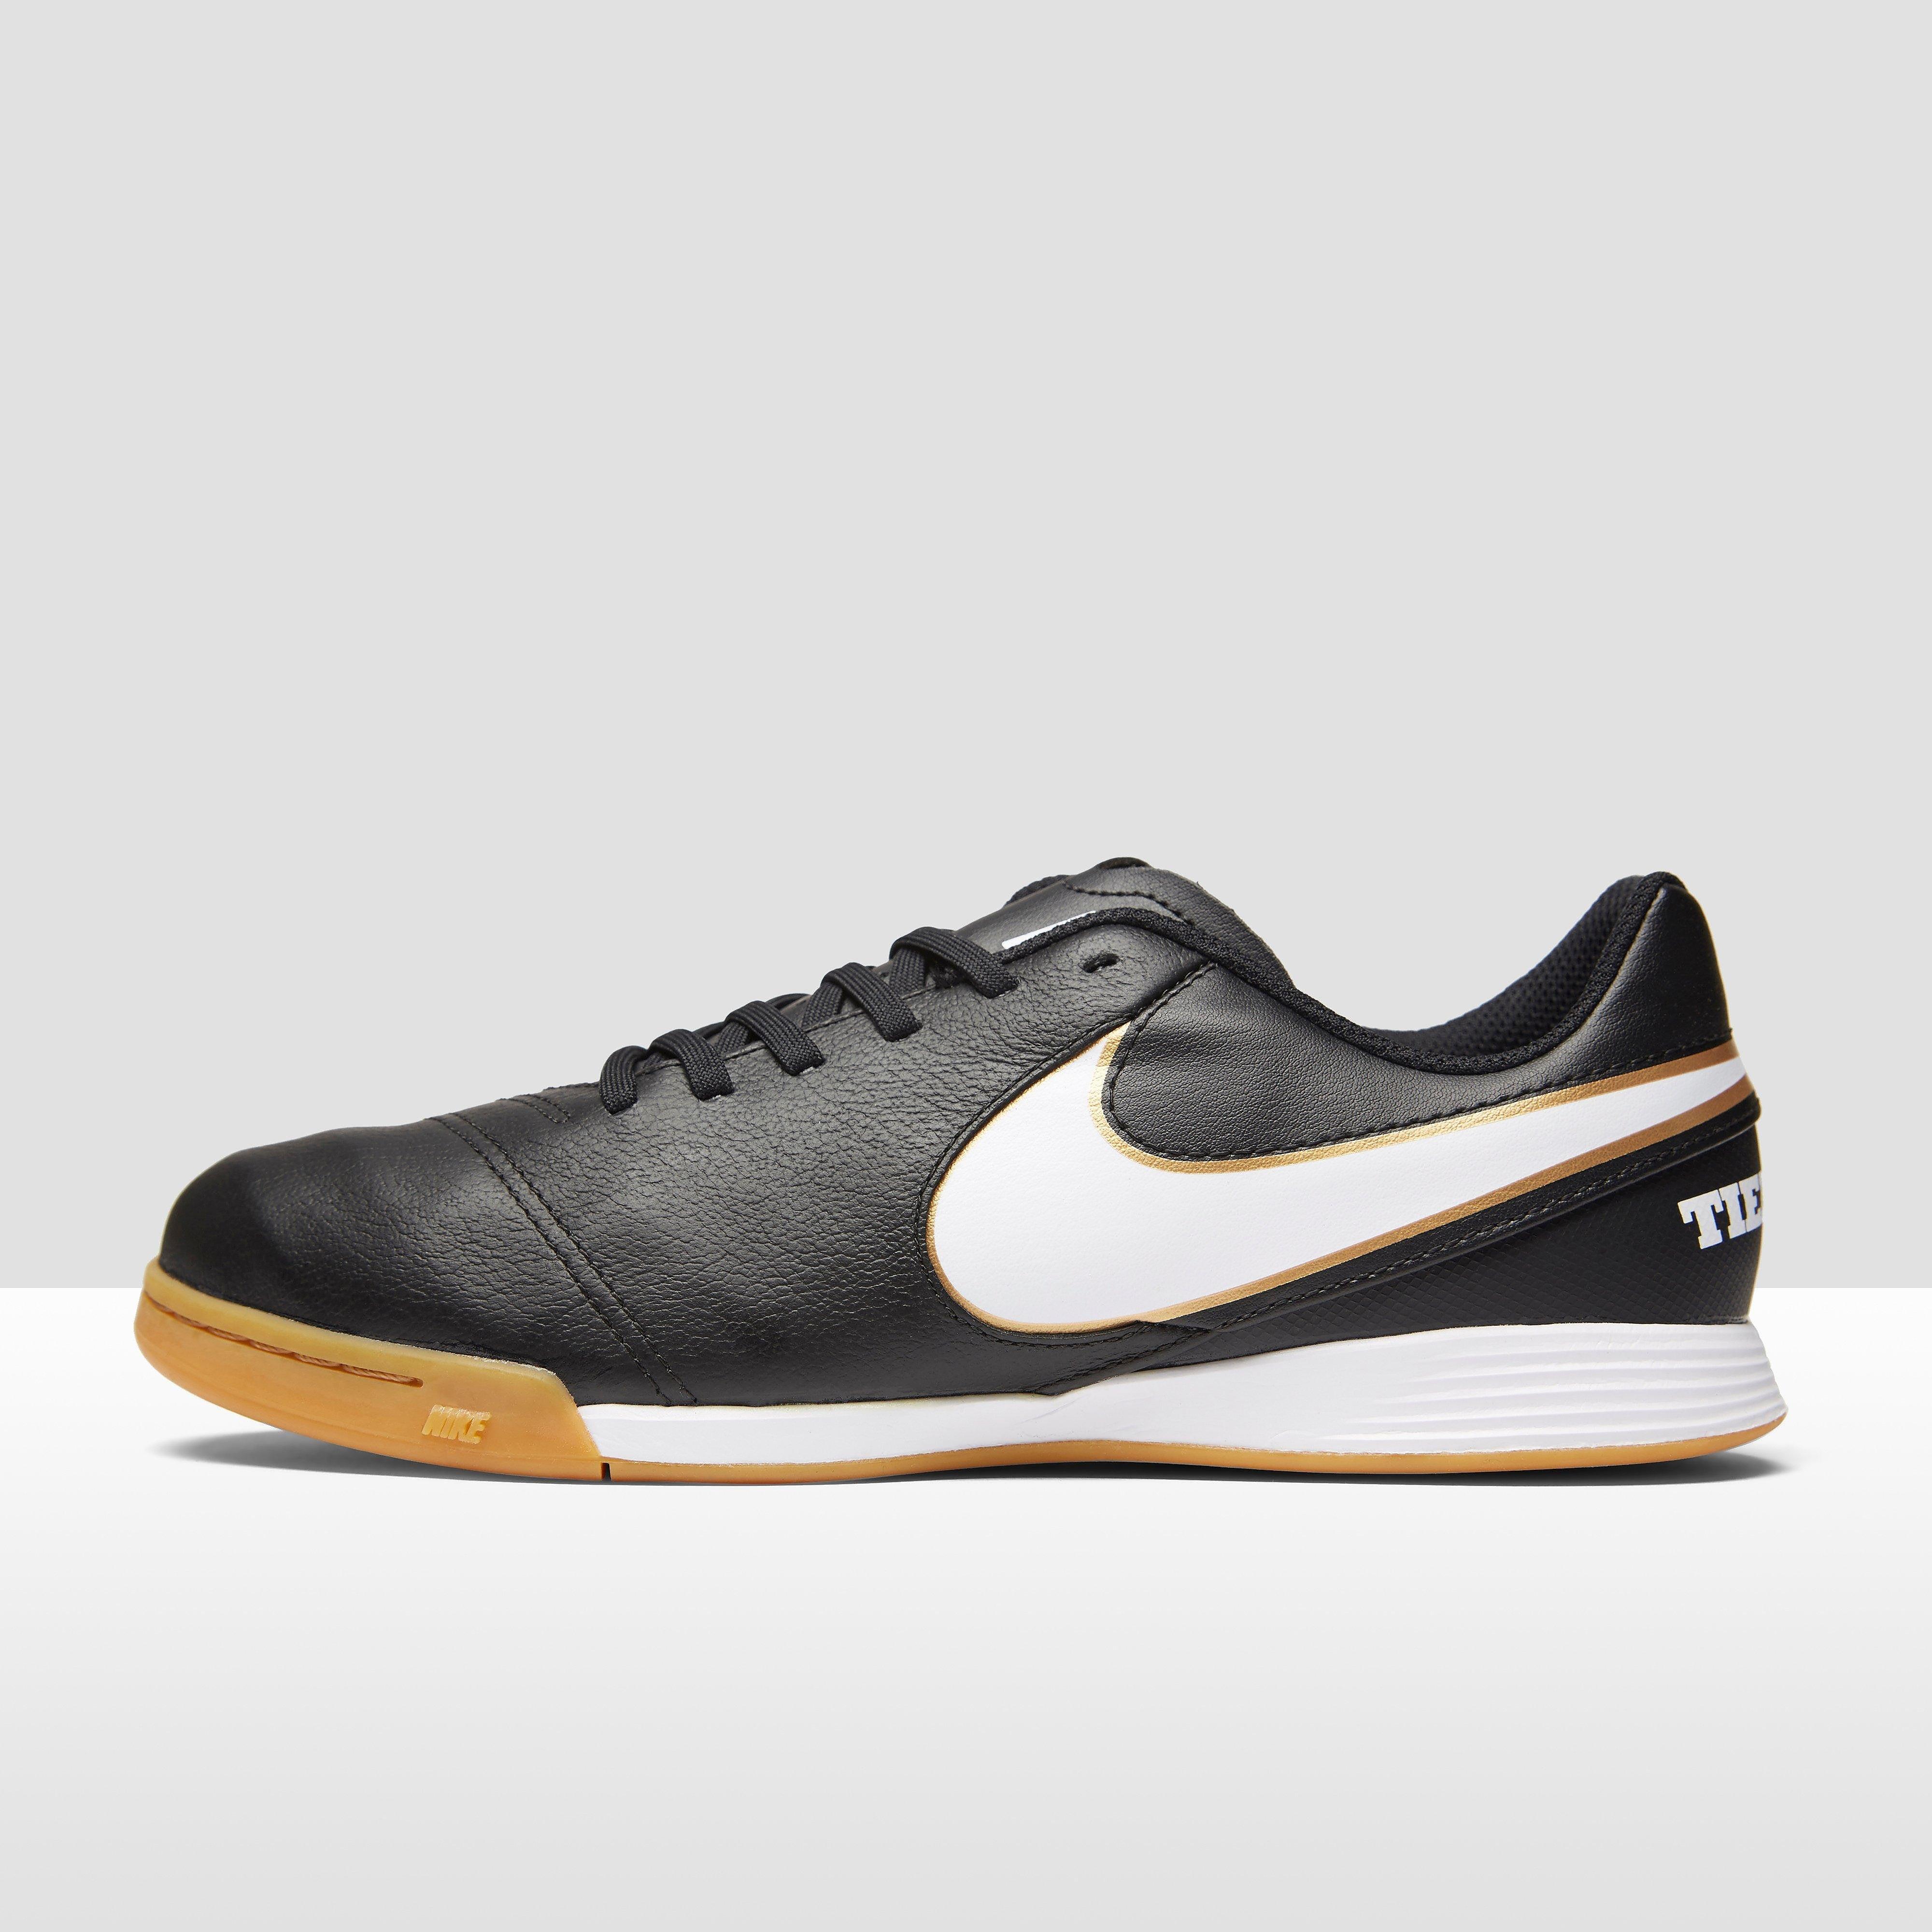 Nike TIEMPO LEGEND VI IC VOETBALSCHOENEN KIDS